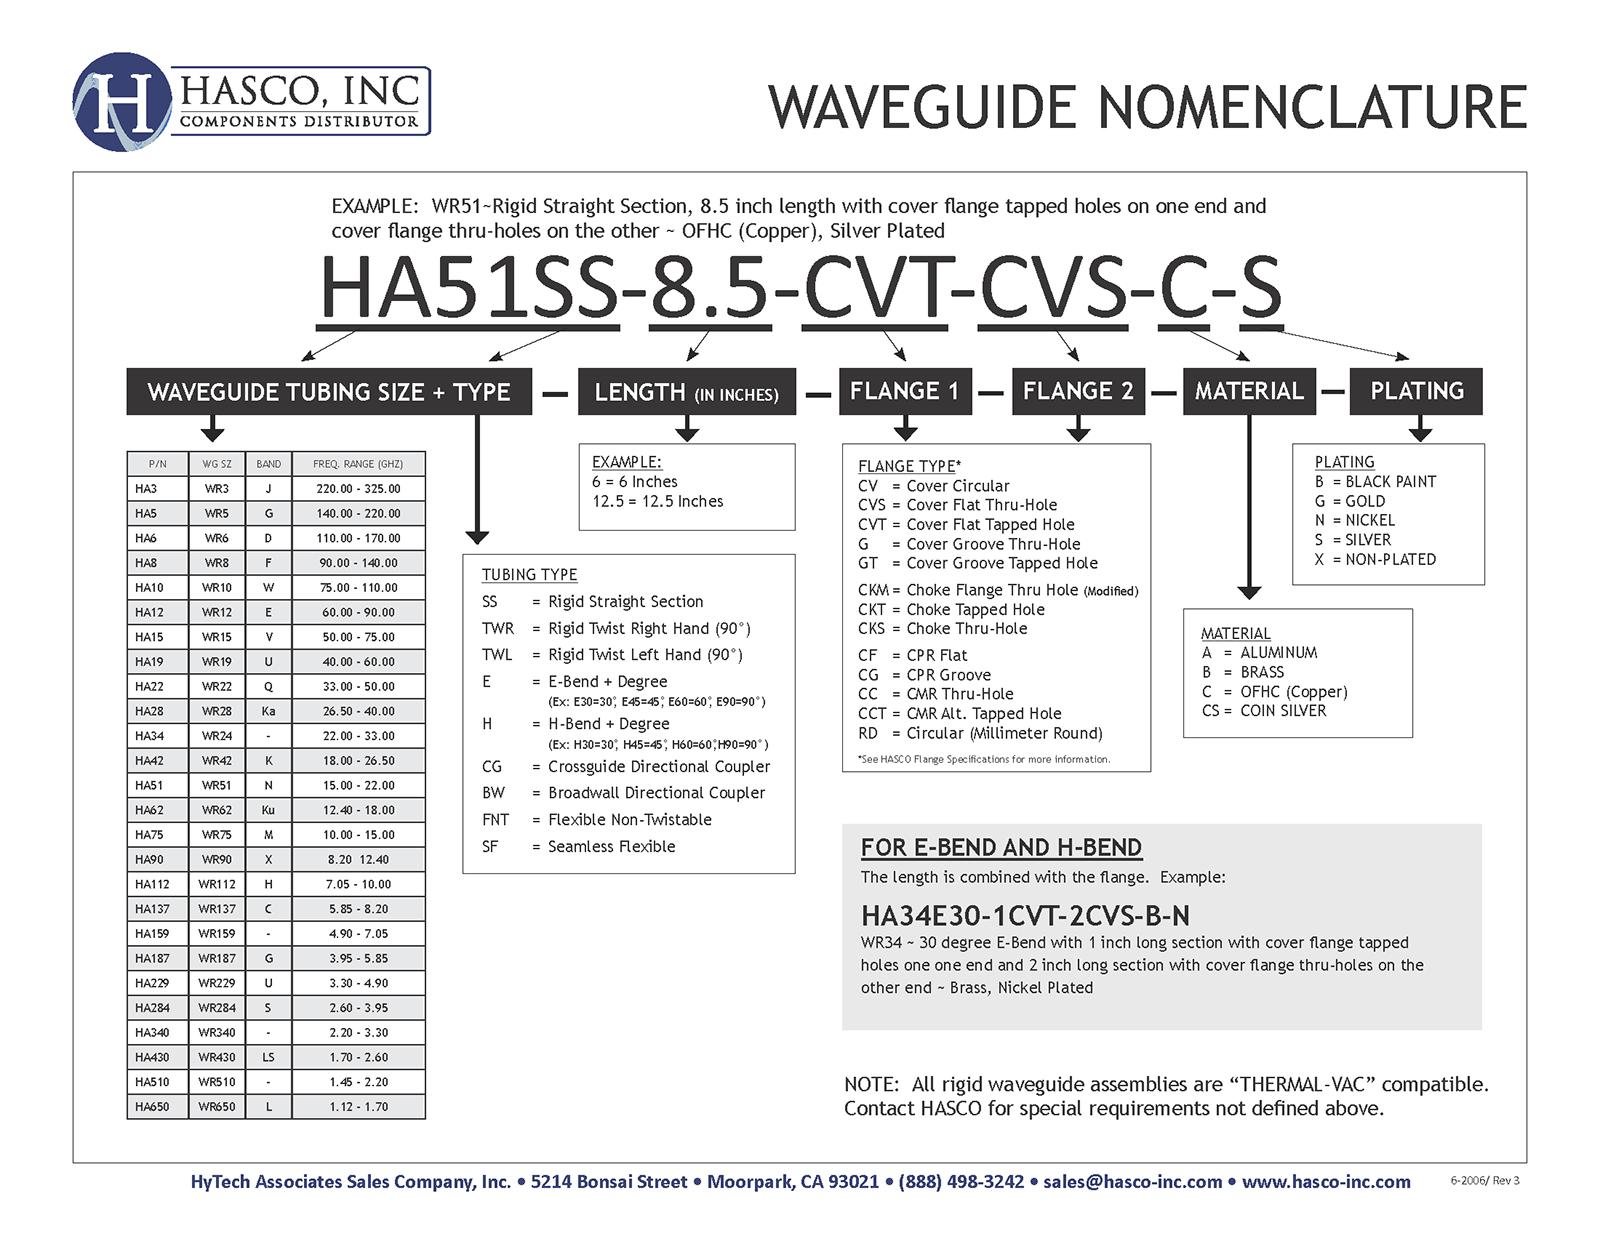 Waveguide Nomenclature